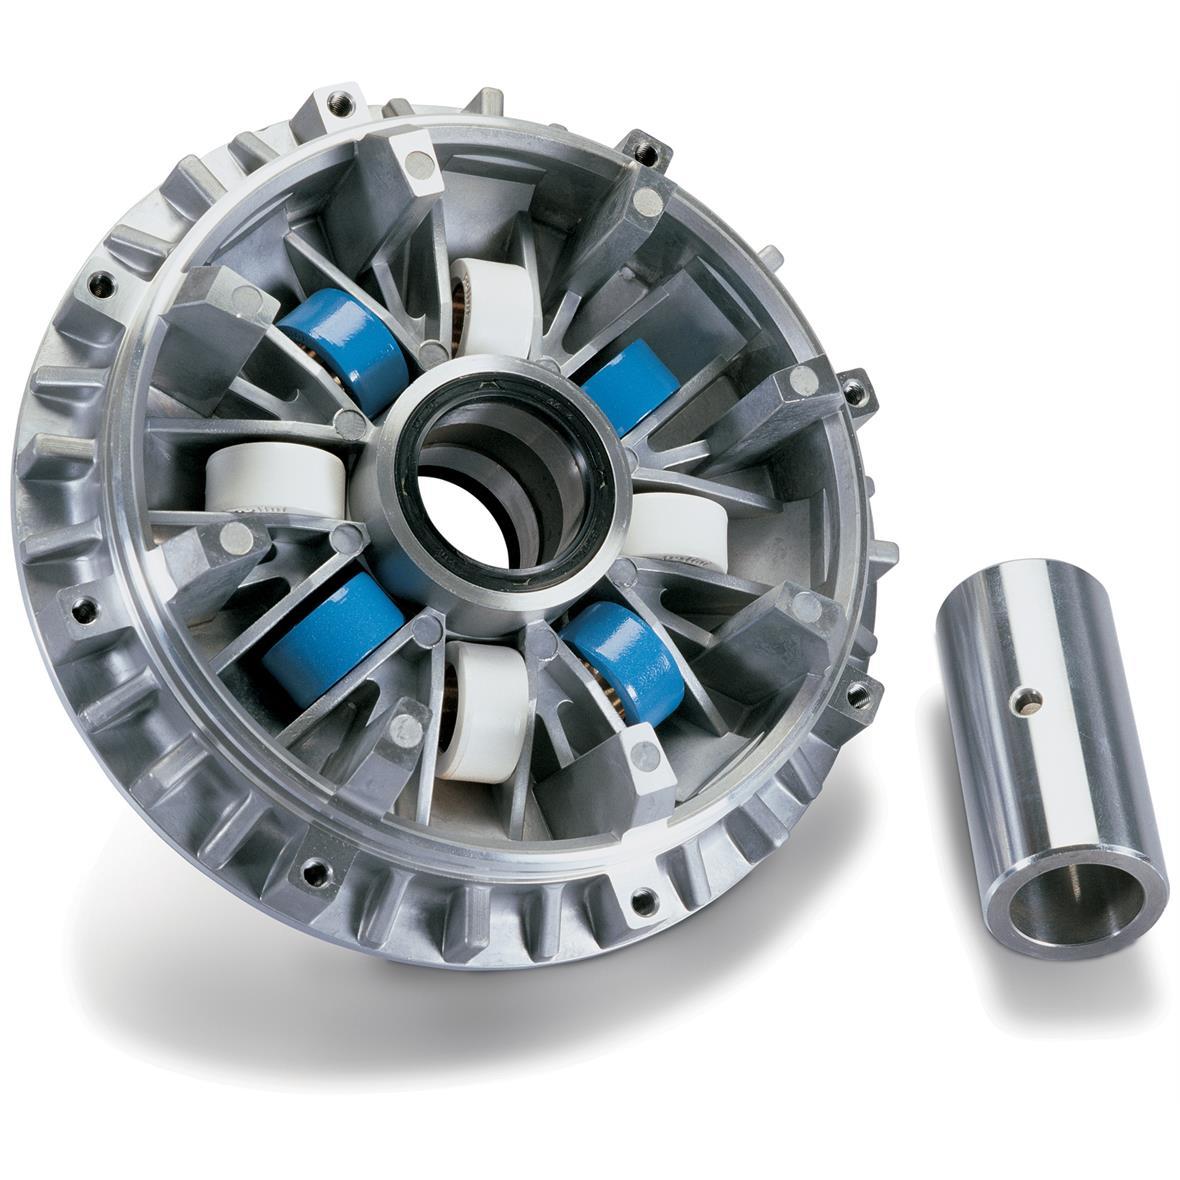 Product Image for 'Variator POLINI Maxi Hi-SpeedTitle'